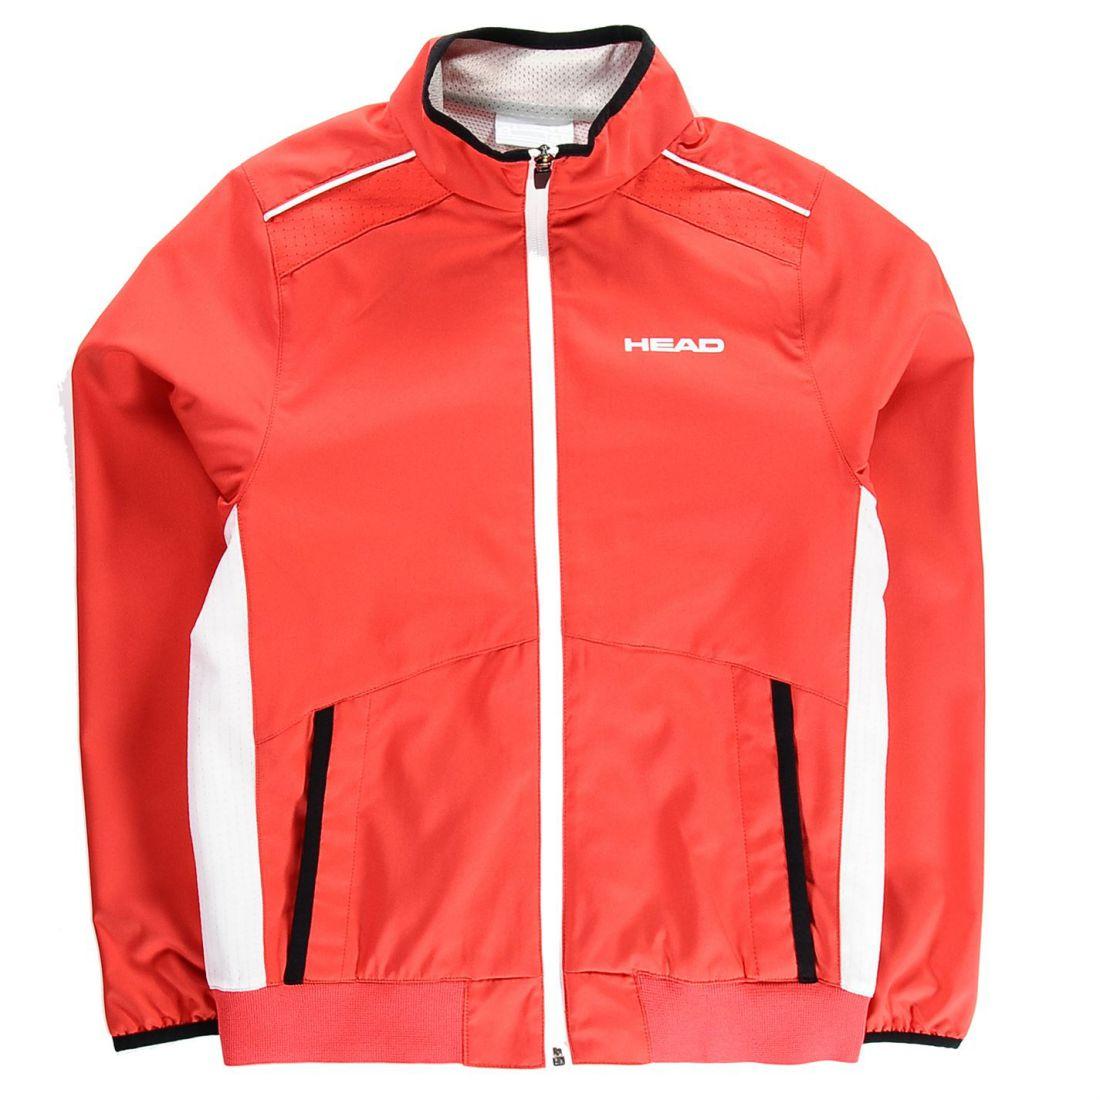 791a1fee5 HEAD Club Boys Jacket Performance Coat Top Full Length Sleeve ...